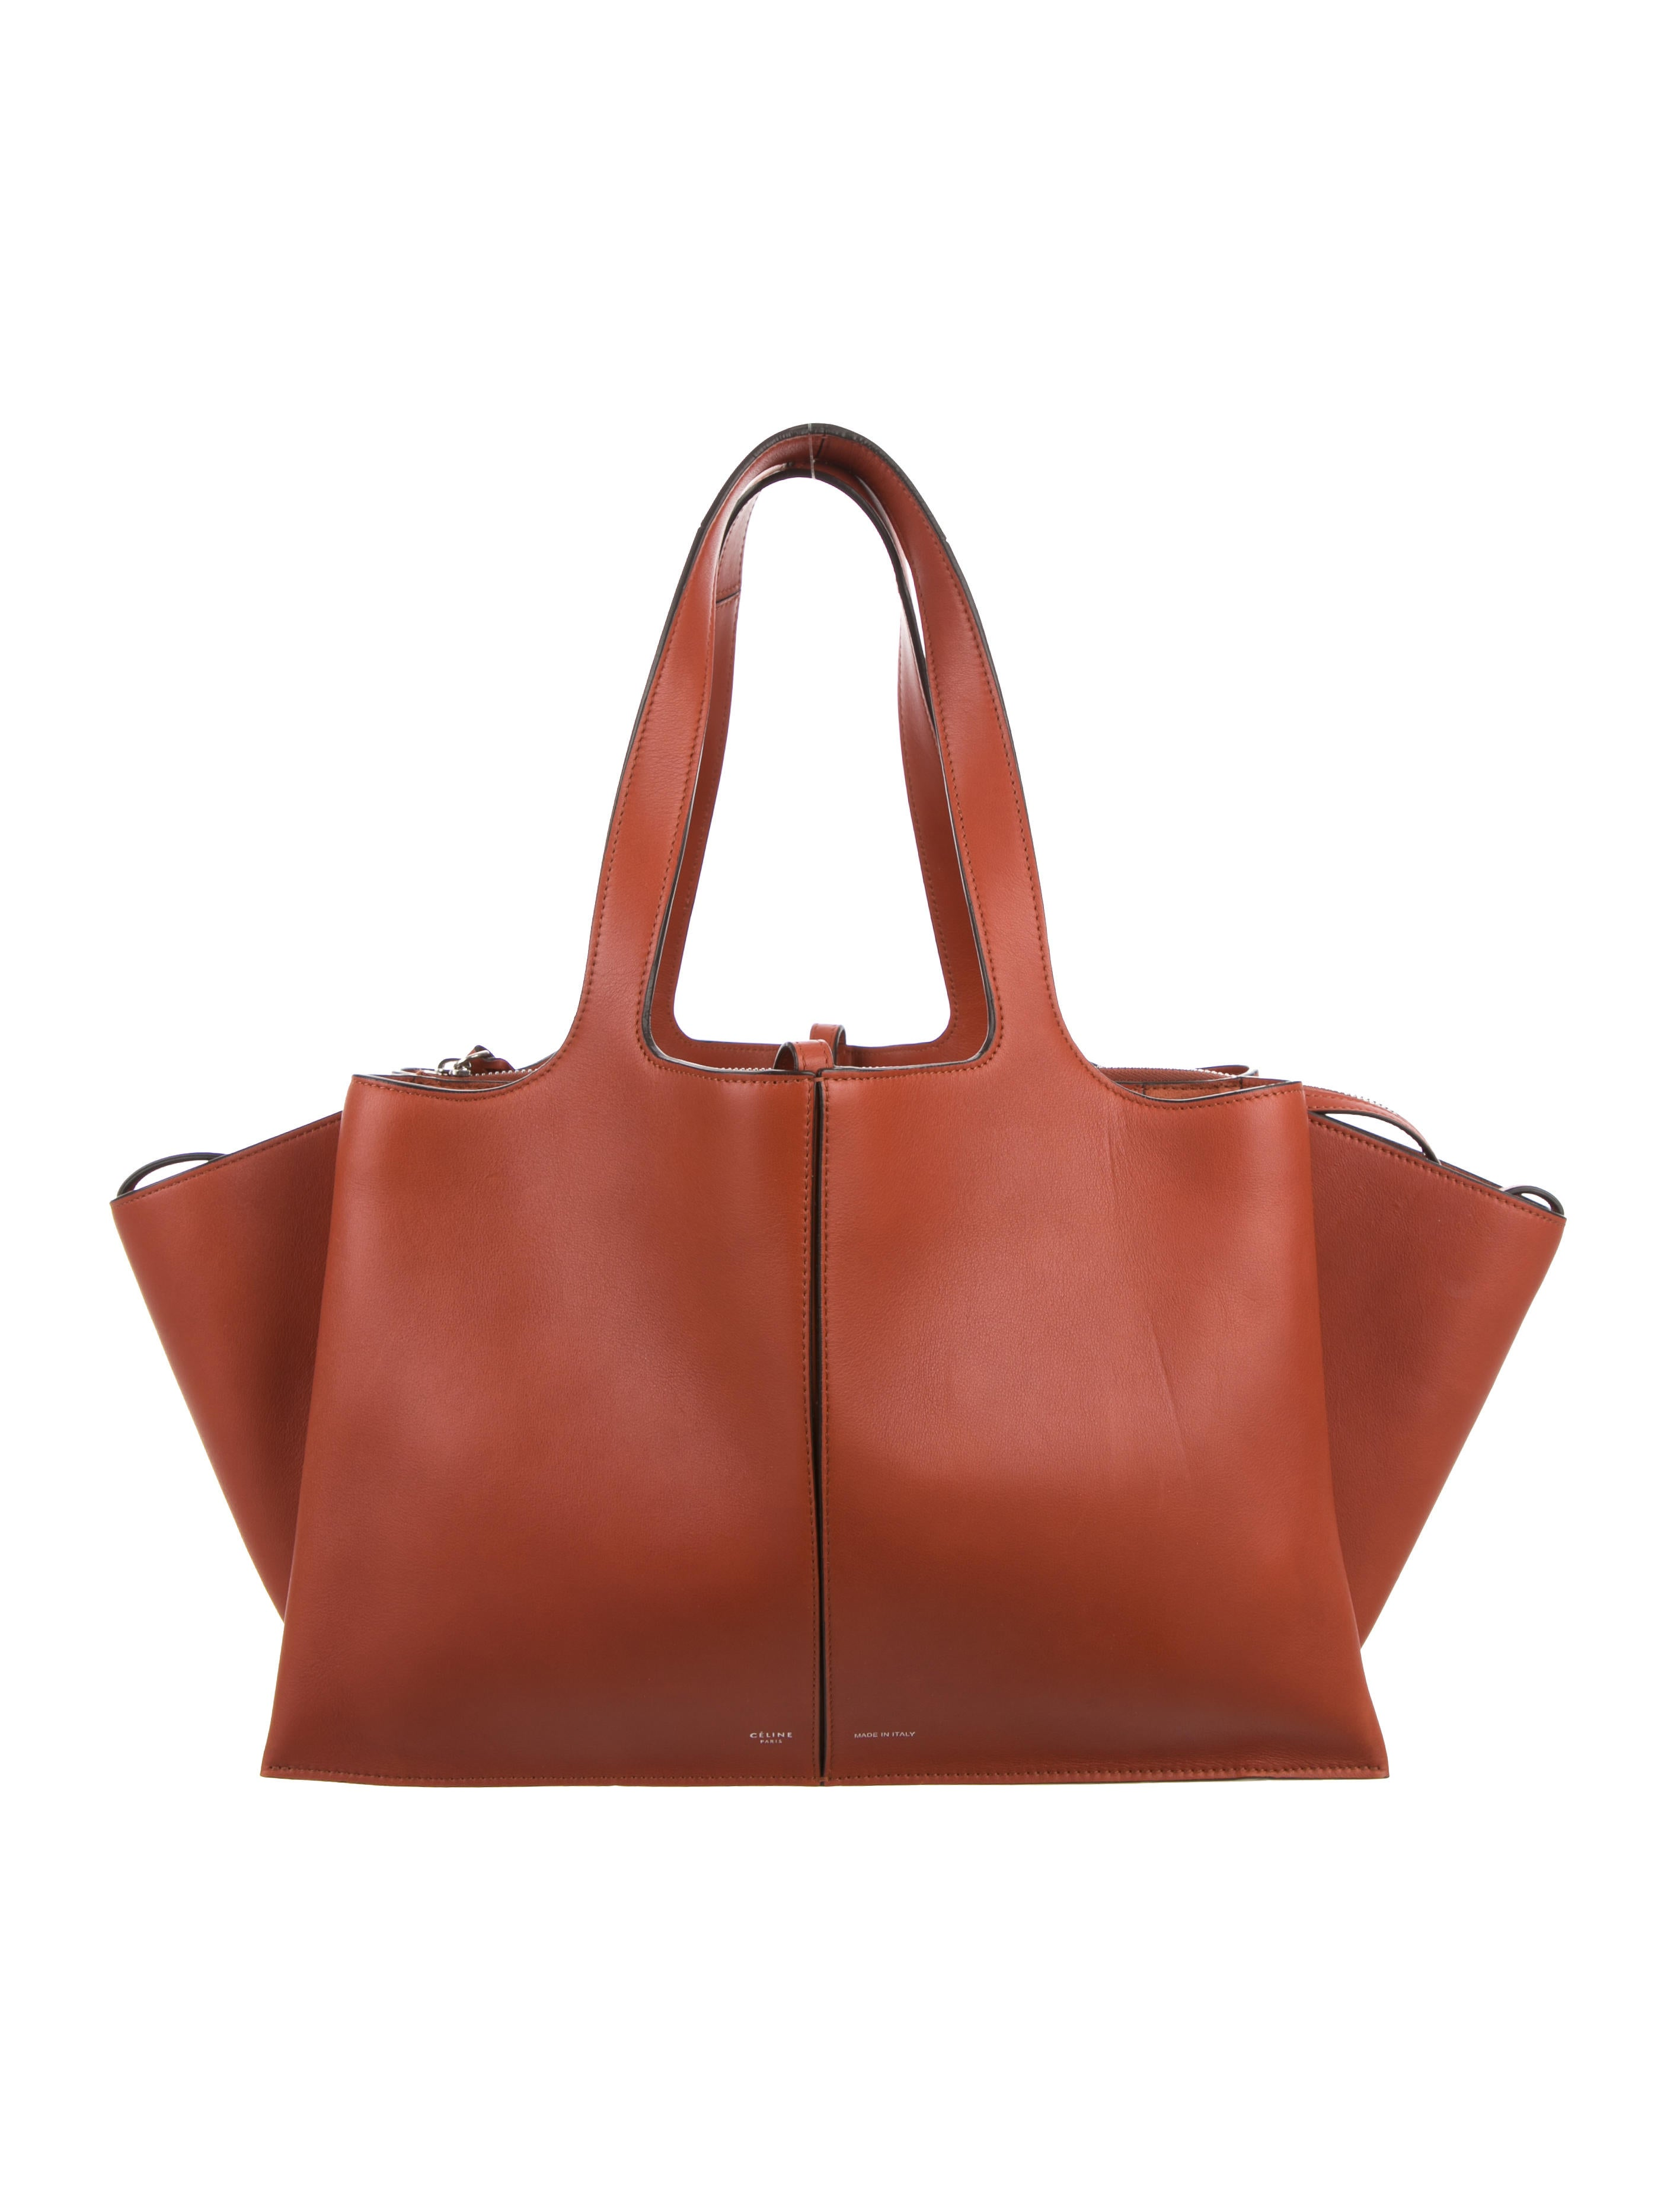 Celine Céline Medium Tri-Fold Shoulder Bag - Handbags - CEL39988 ... 897d1e9a02e2d